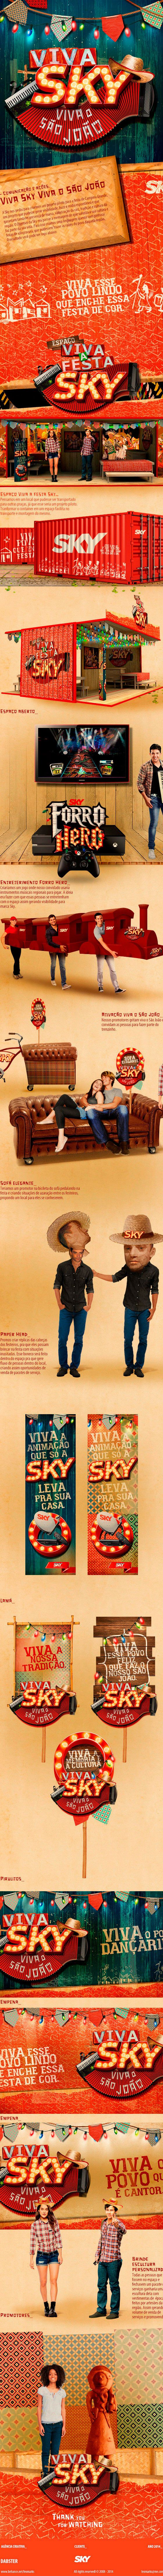 SKY // Campanha Viva Sky on Behance